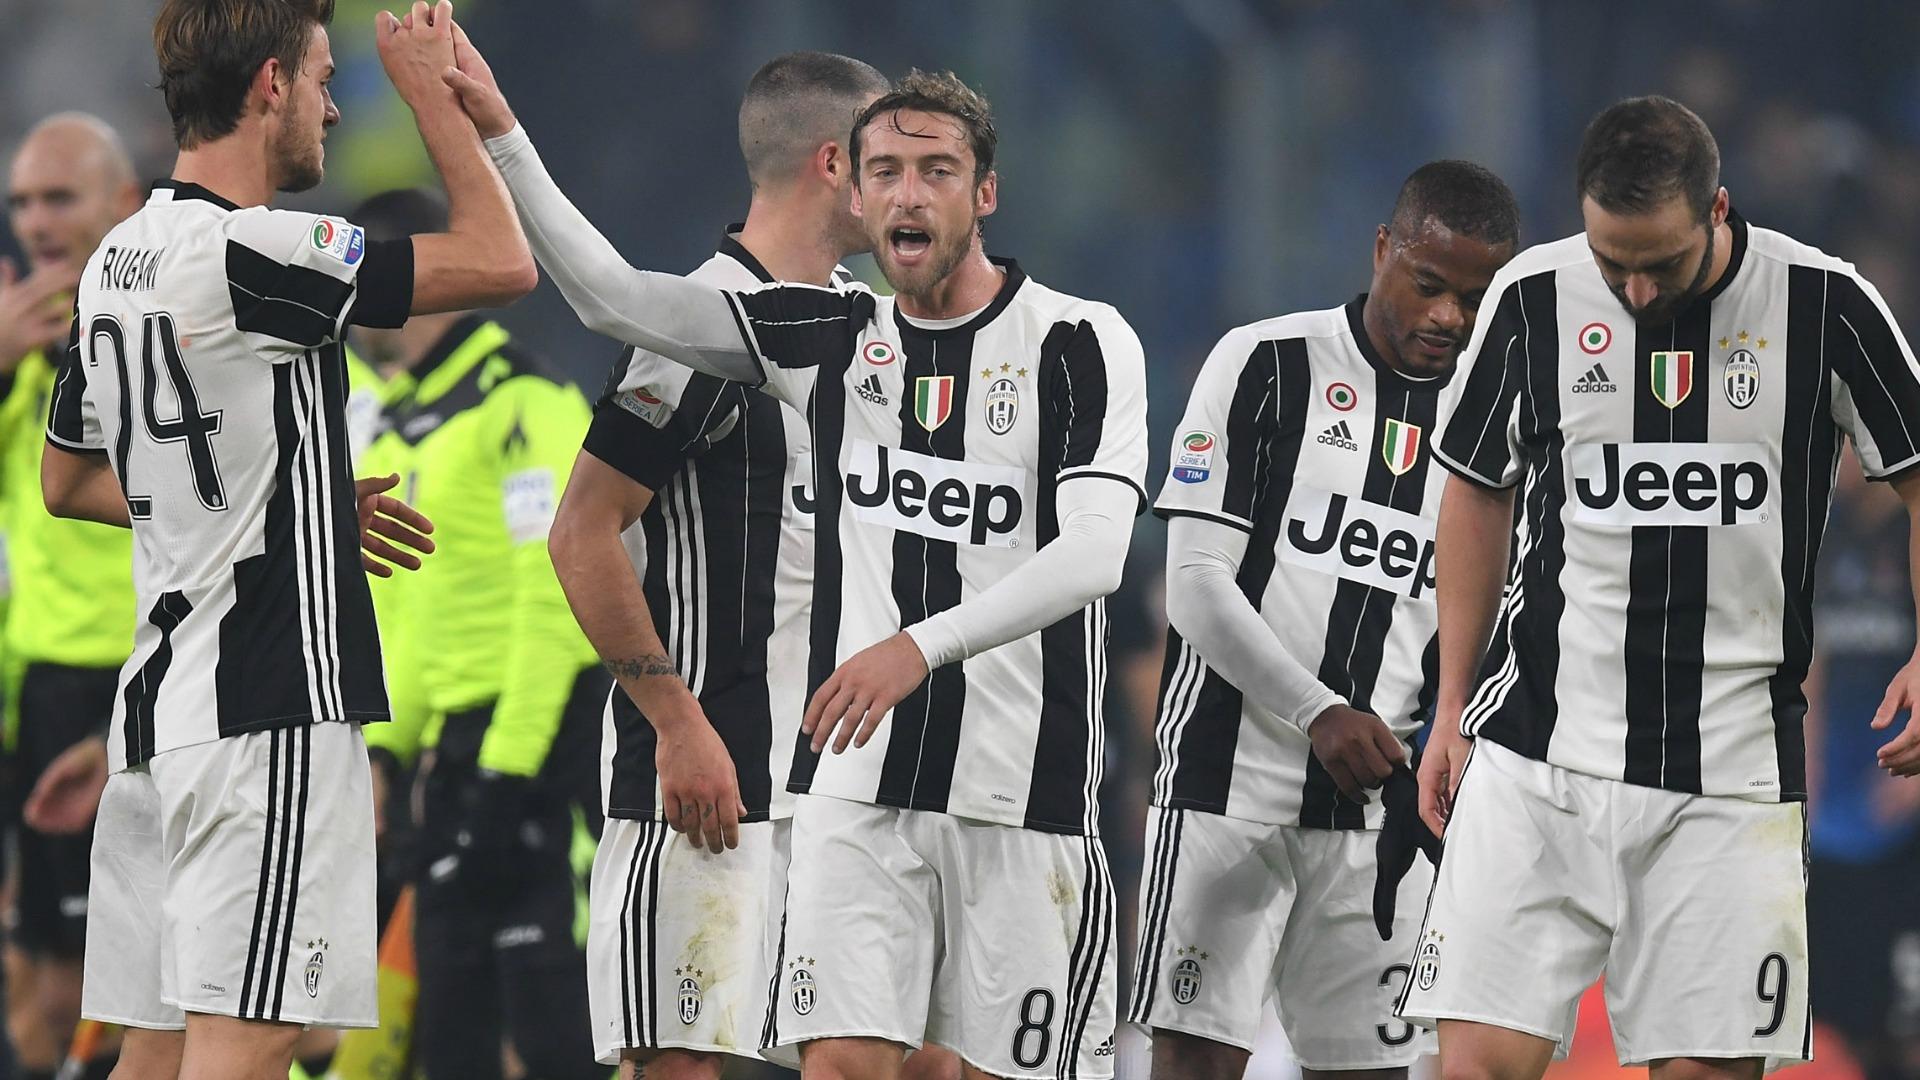 Scommesse Champions League: quote e pronostico di Juventus